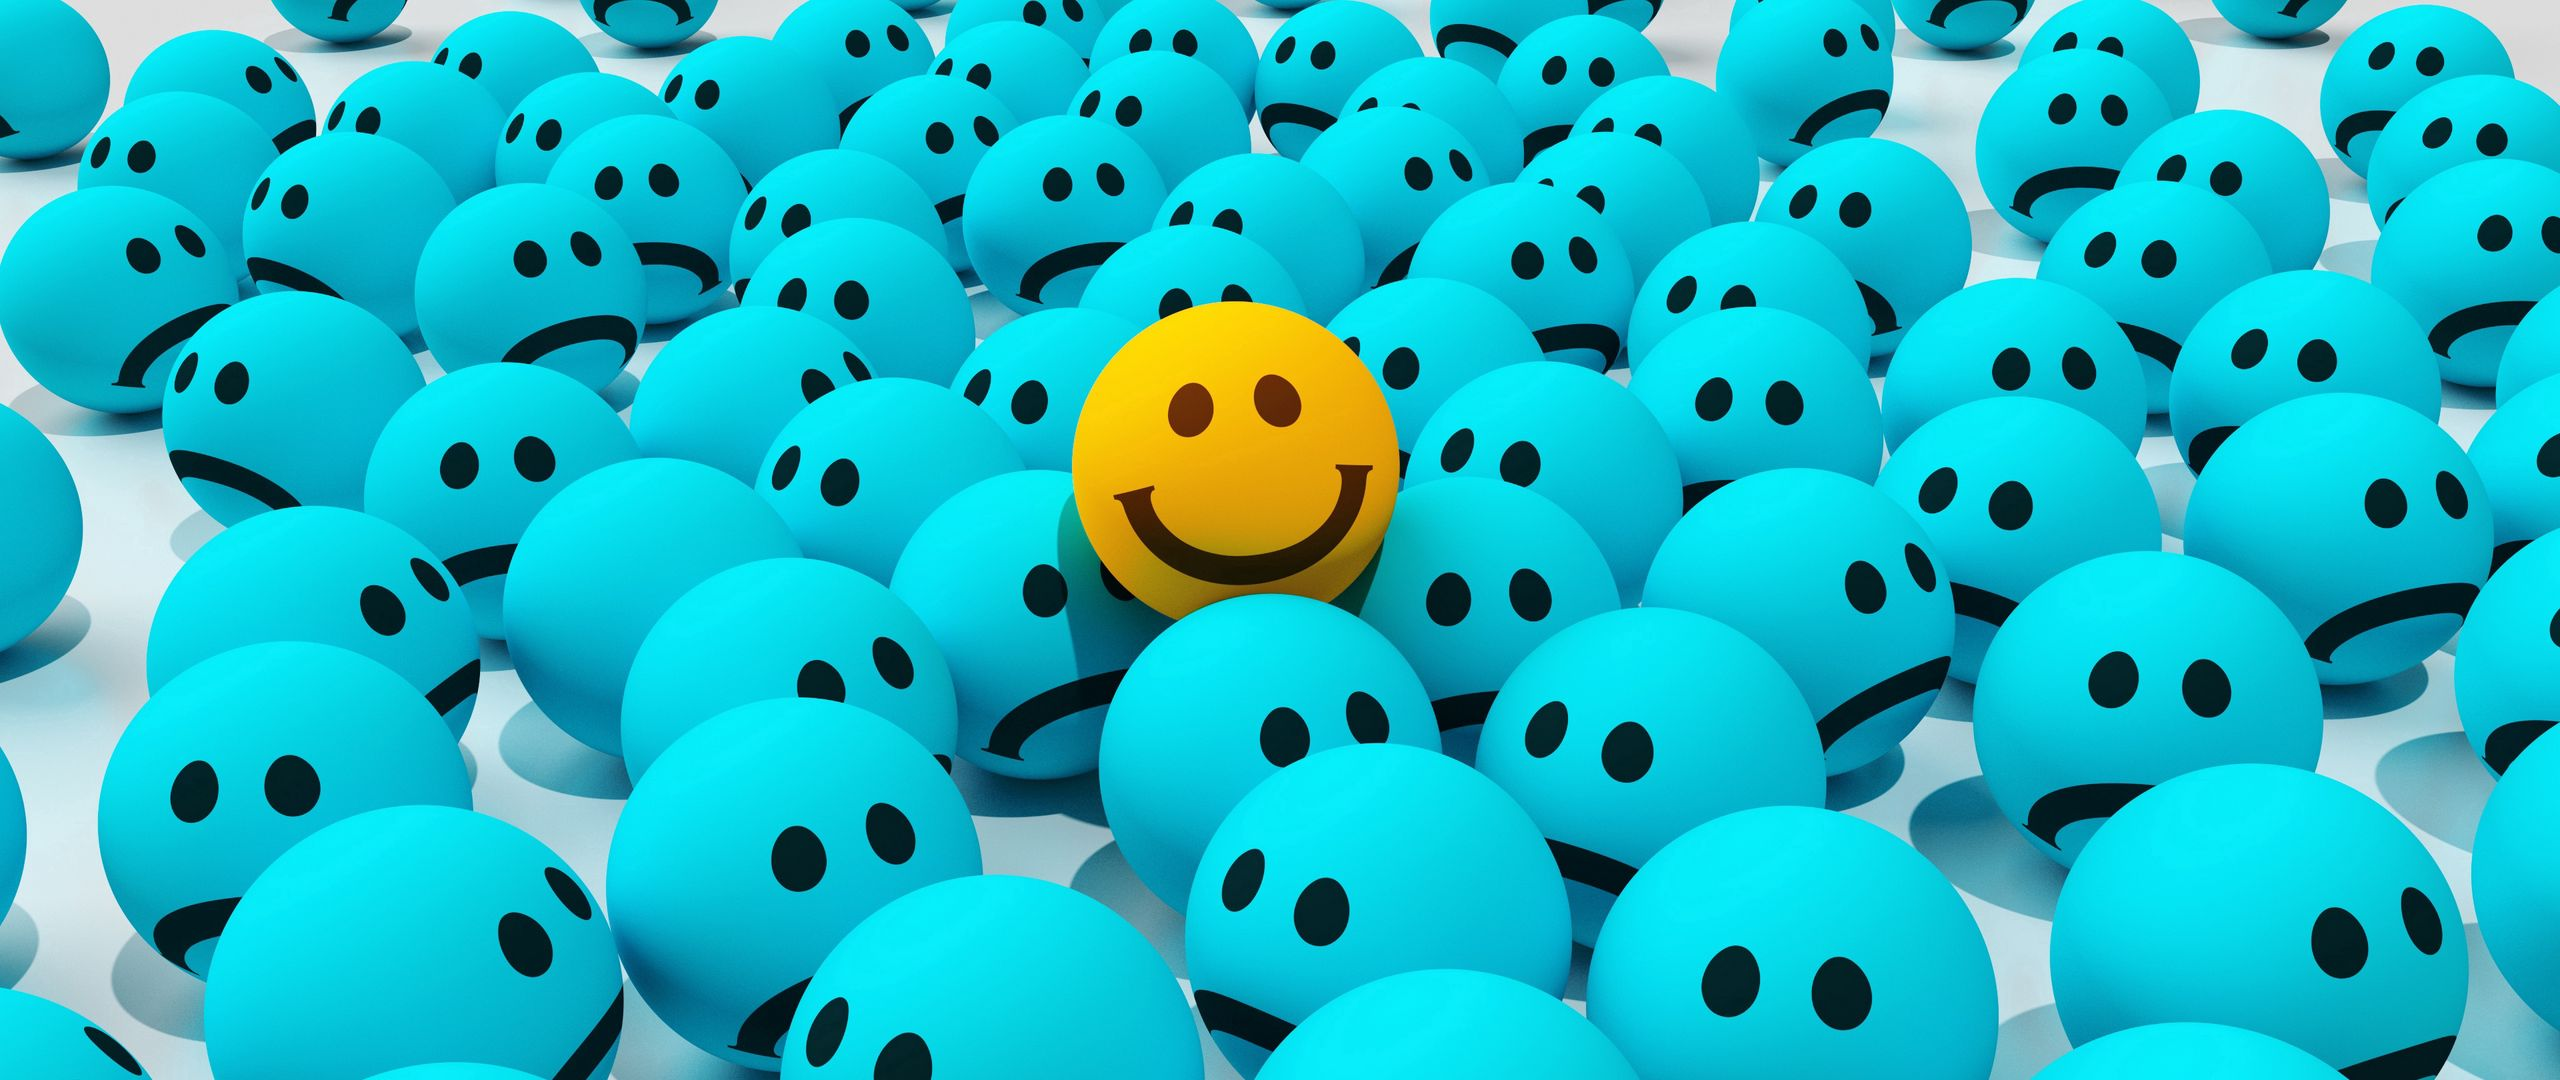 2560x1080 Wallpaper smiles, joy, sadness